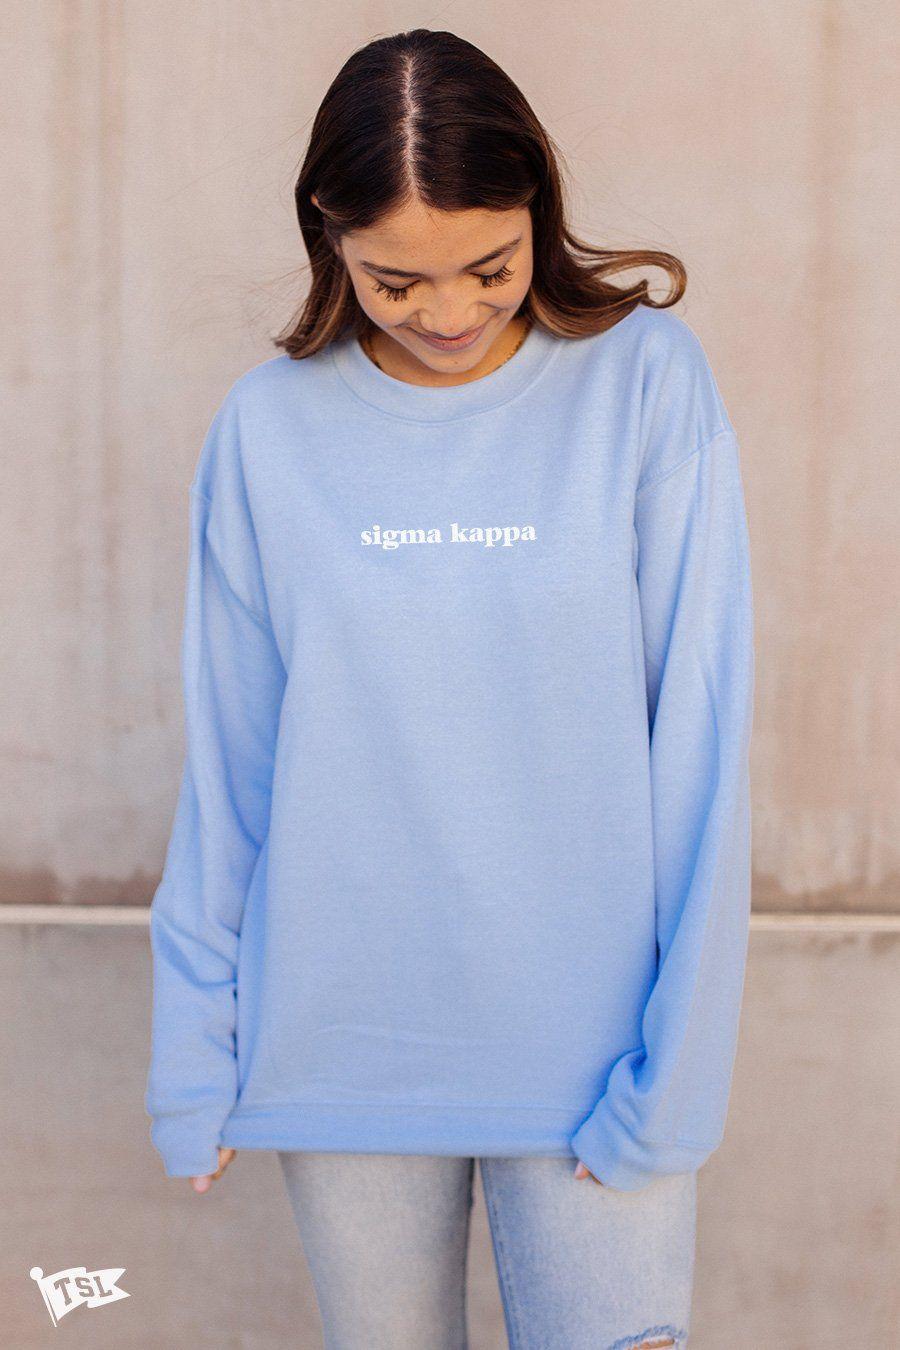 Sigma Kappa Baby Crewneck Light Blue Crewneck Basic Sweatshirt Chi Omega Sweatshirt [ 1350 x 900 Pixel ]